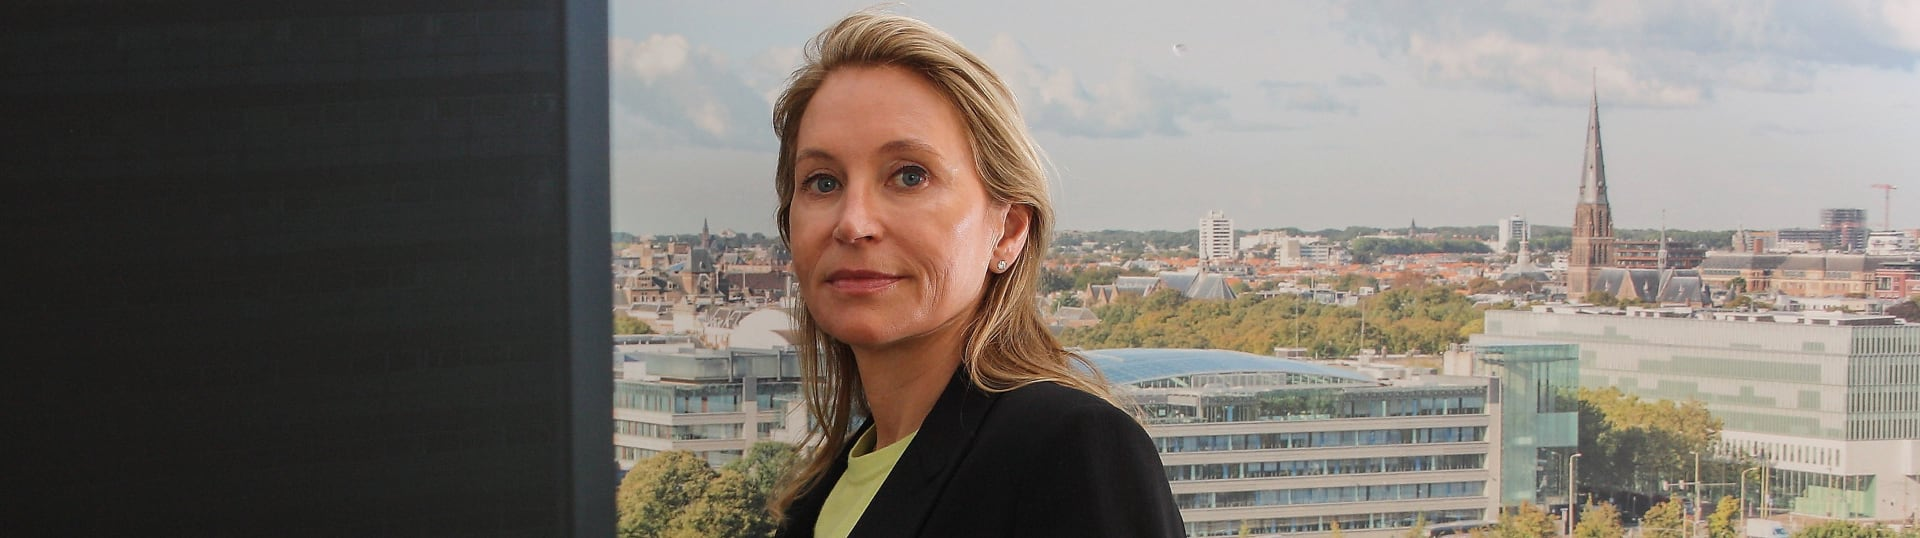 Susi Zijderveld